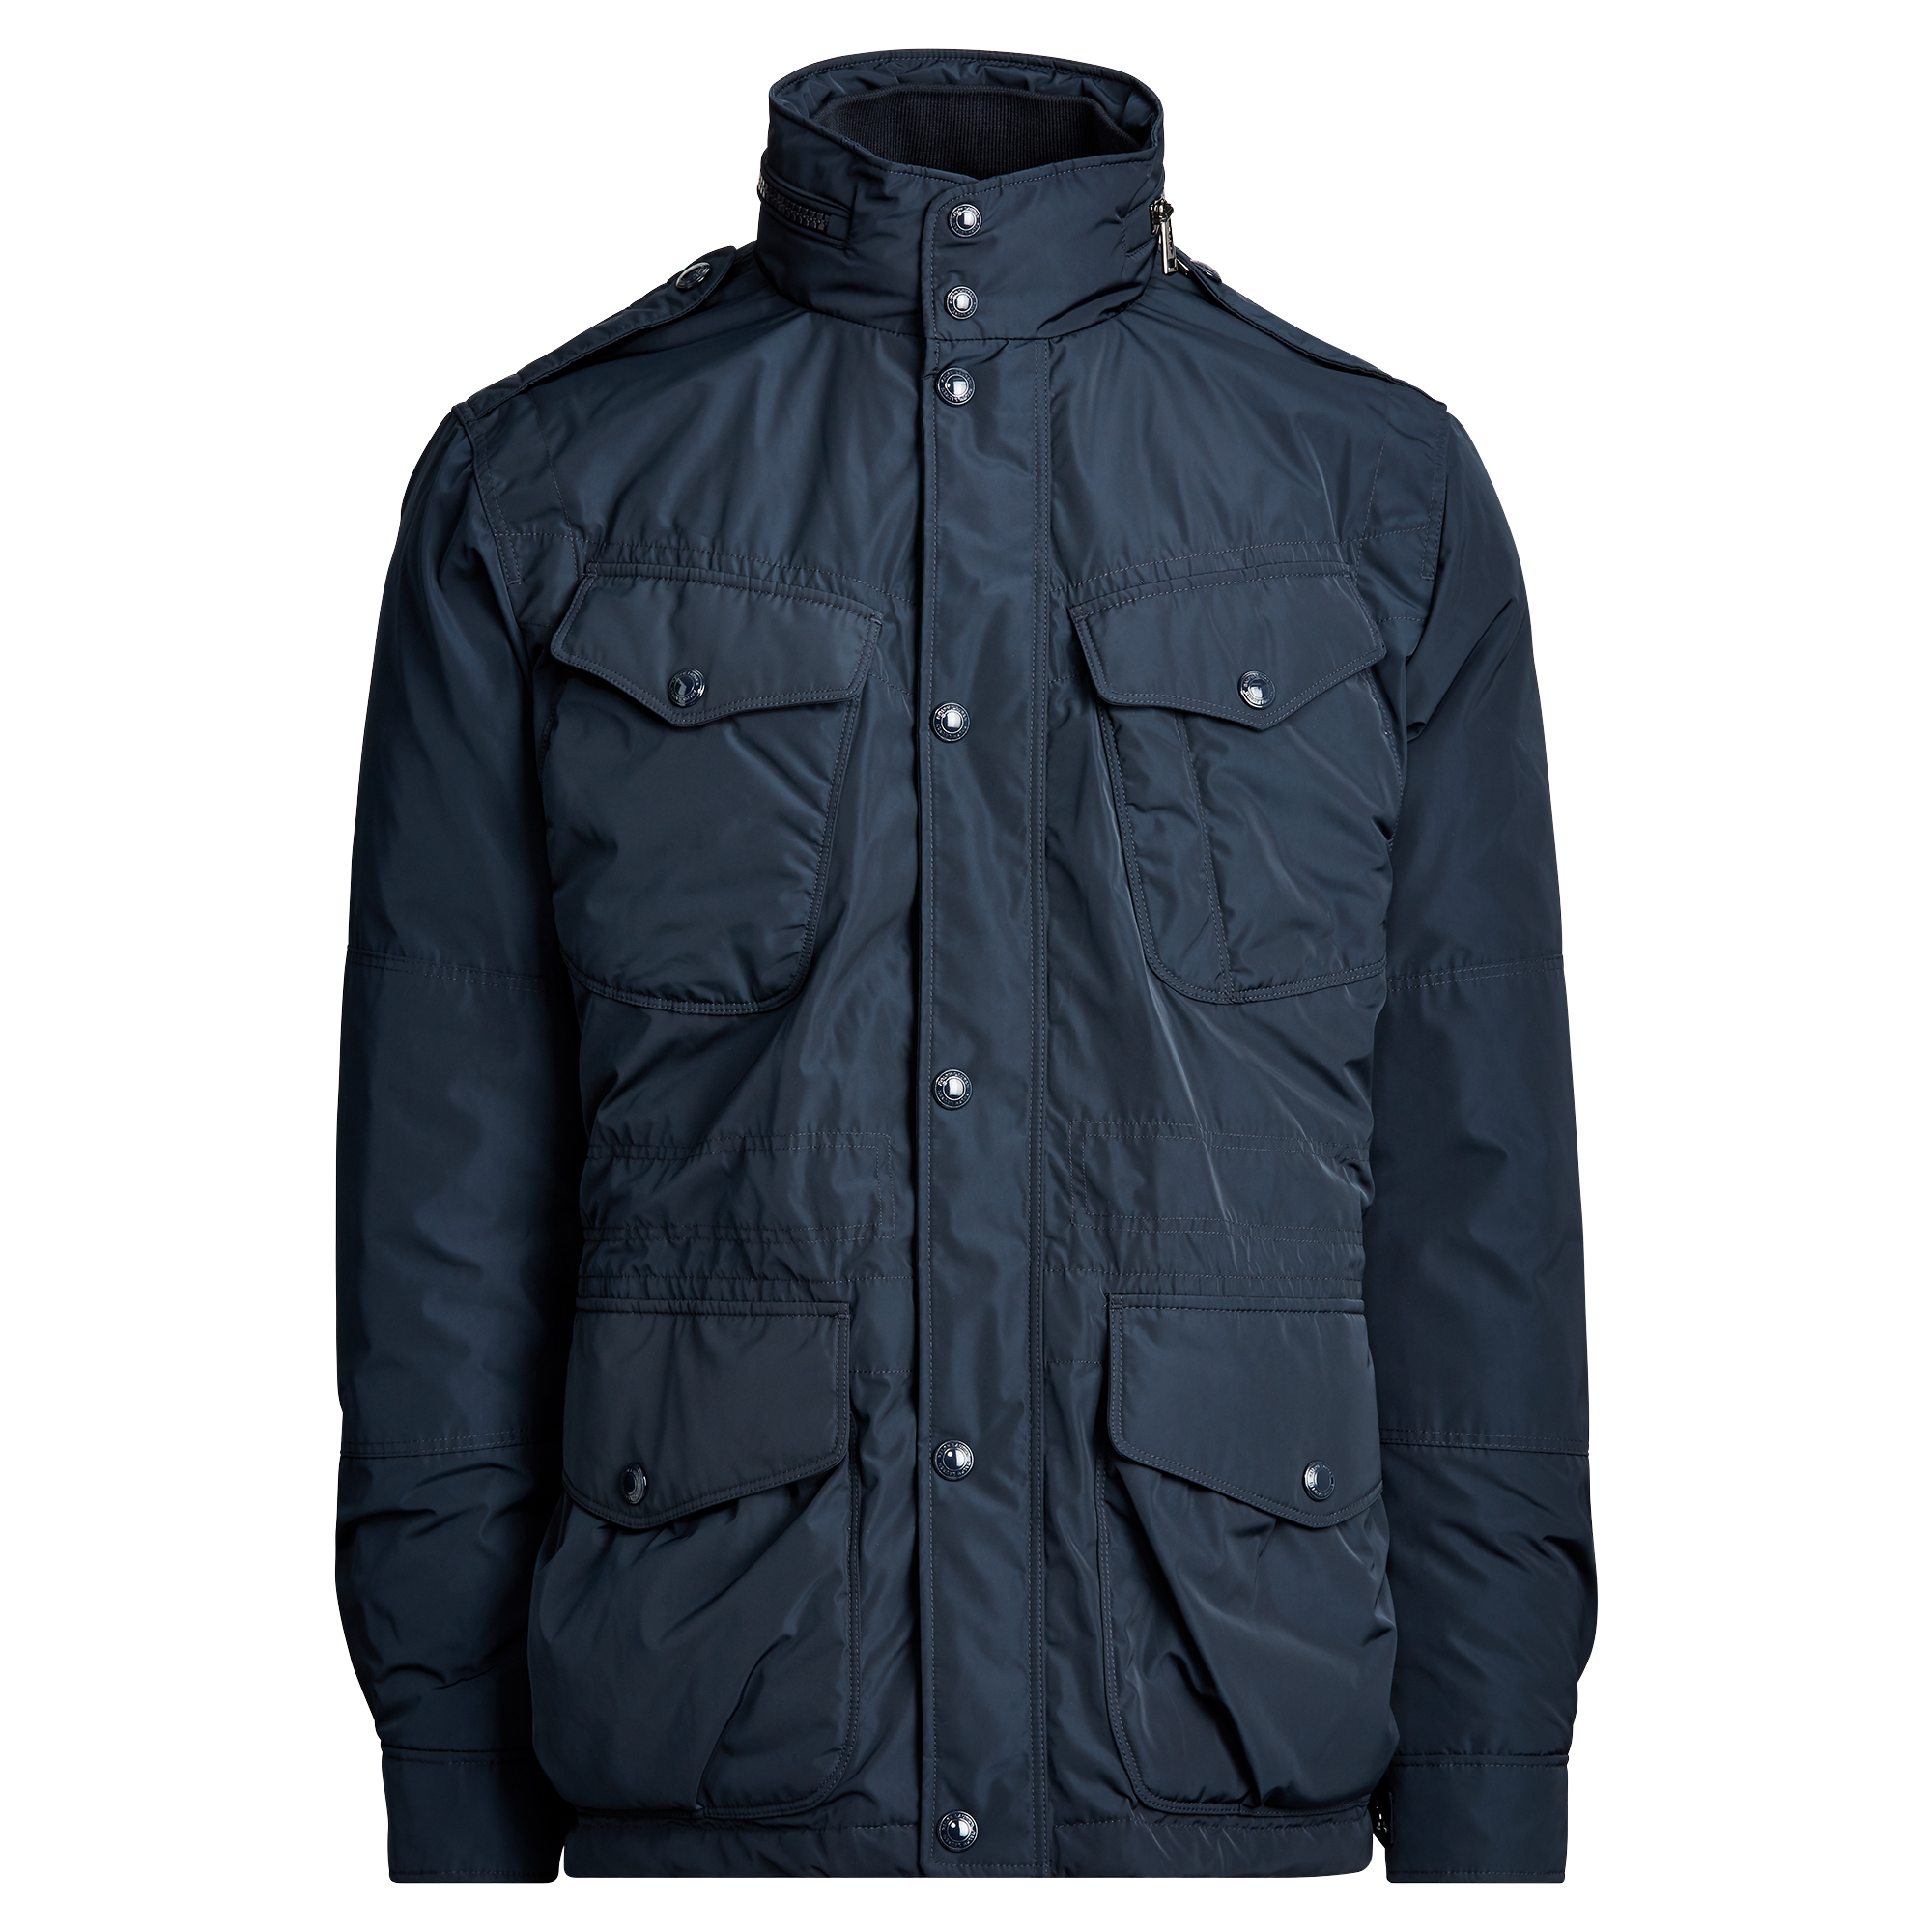 Ralph Lauren 4 Pocket Jacke Aviator Navy Verkauf bei